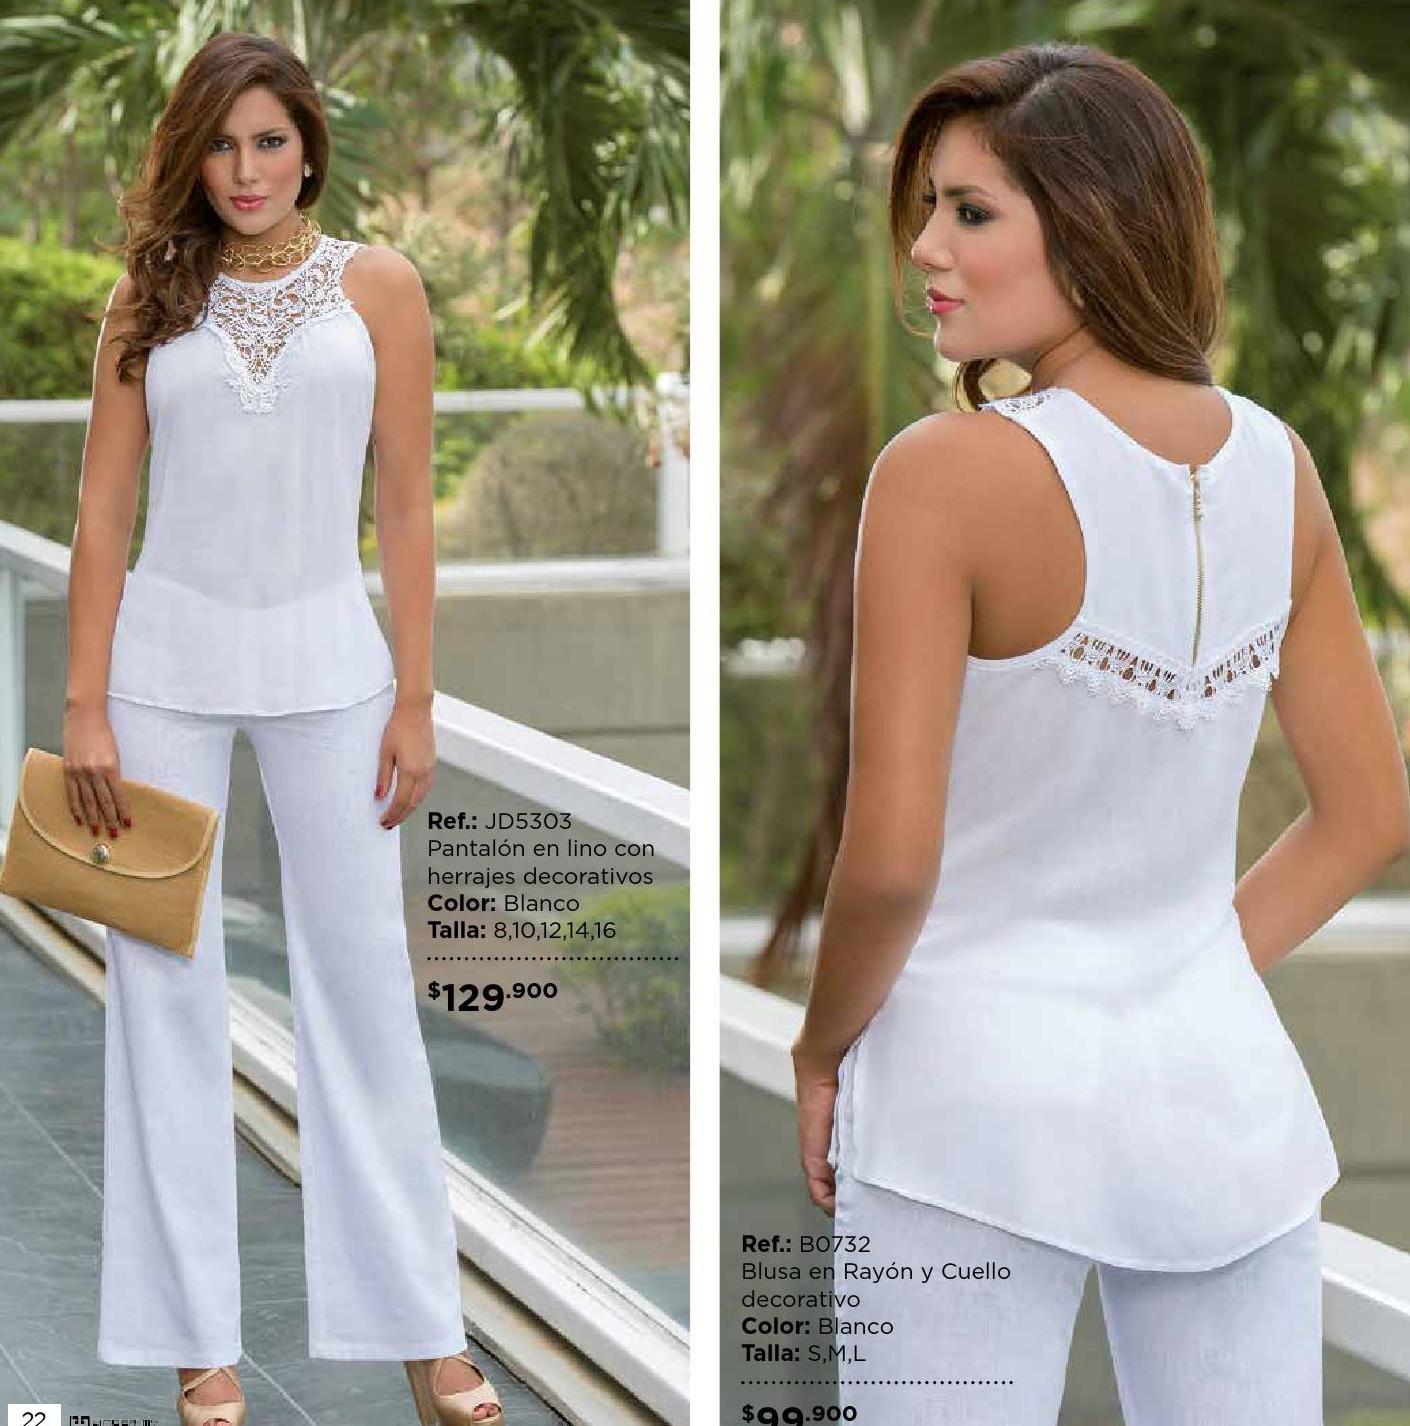 Catalogo Lingermy Moda Feminina Blusas Femininas Blusas Femininas Da Moda